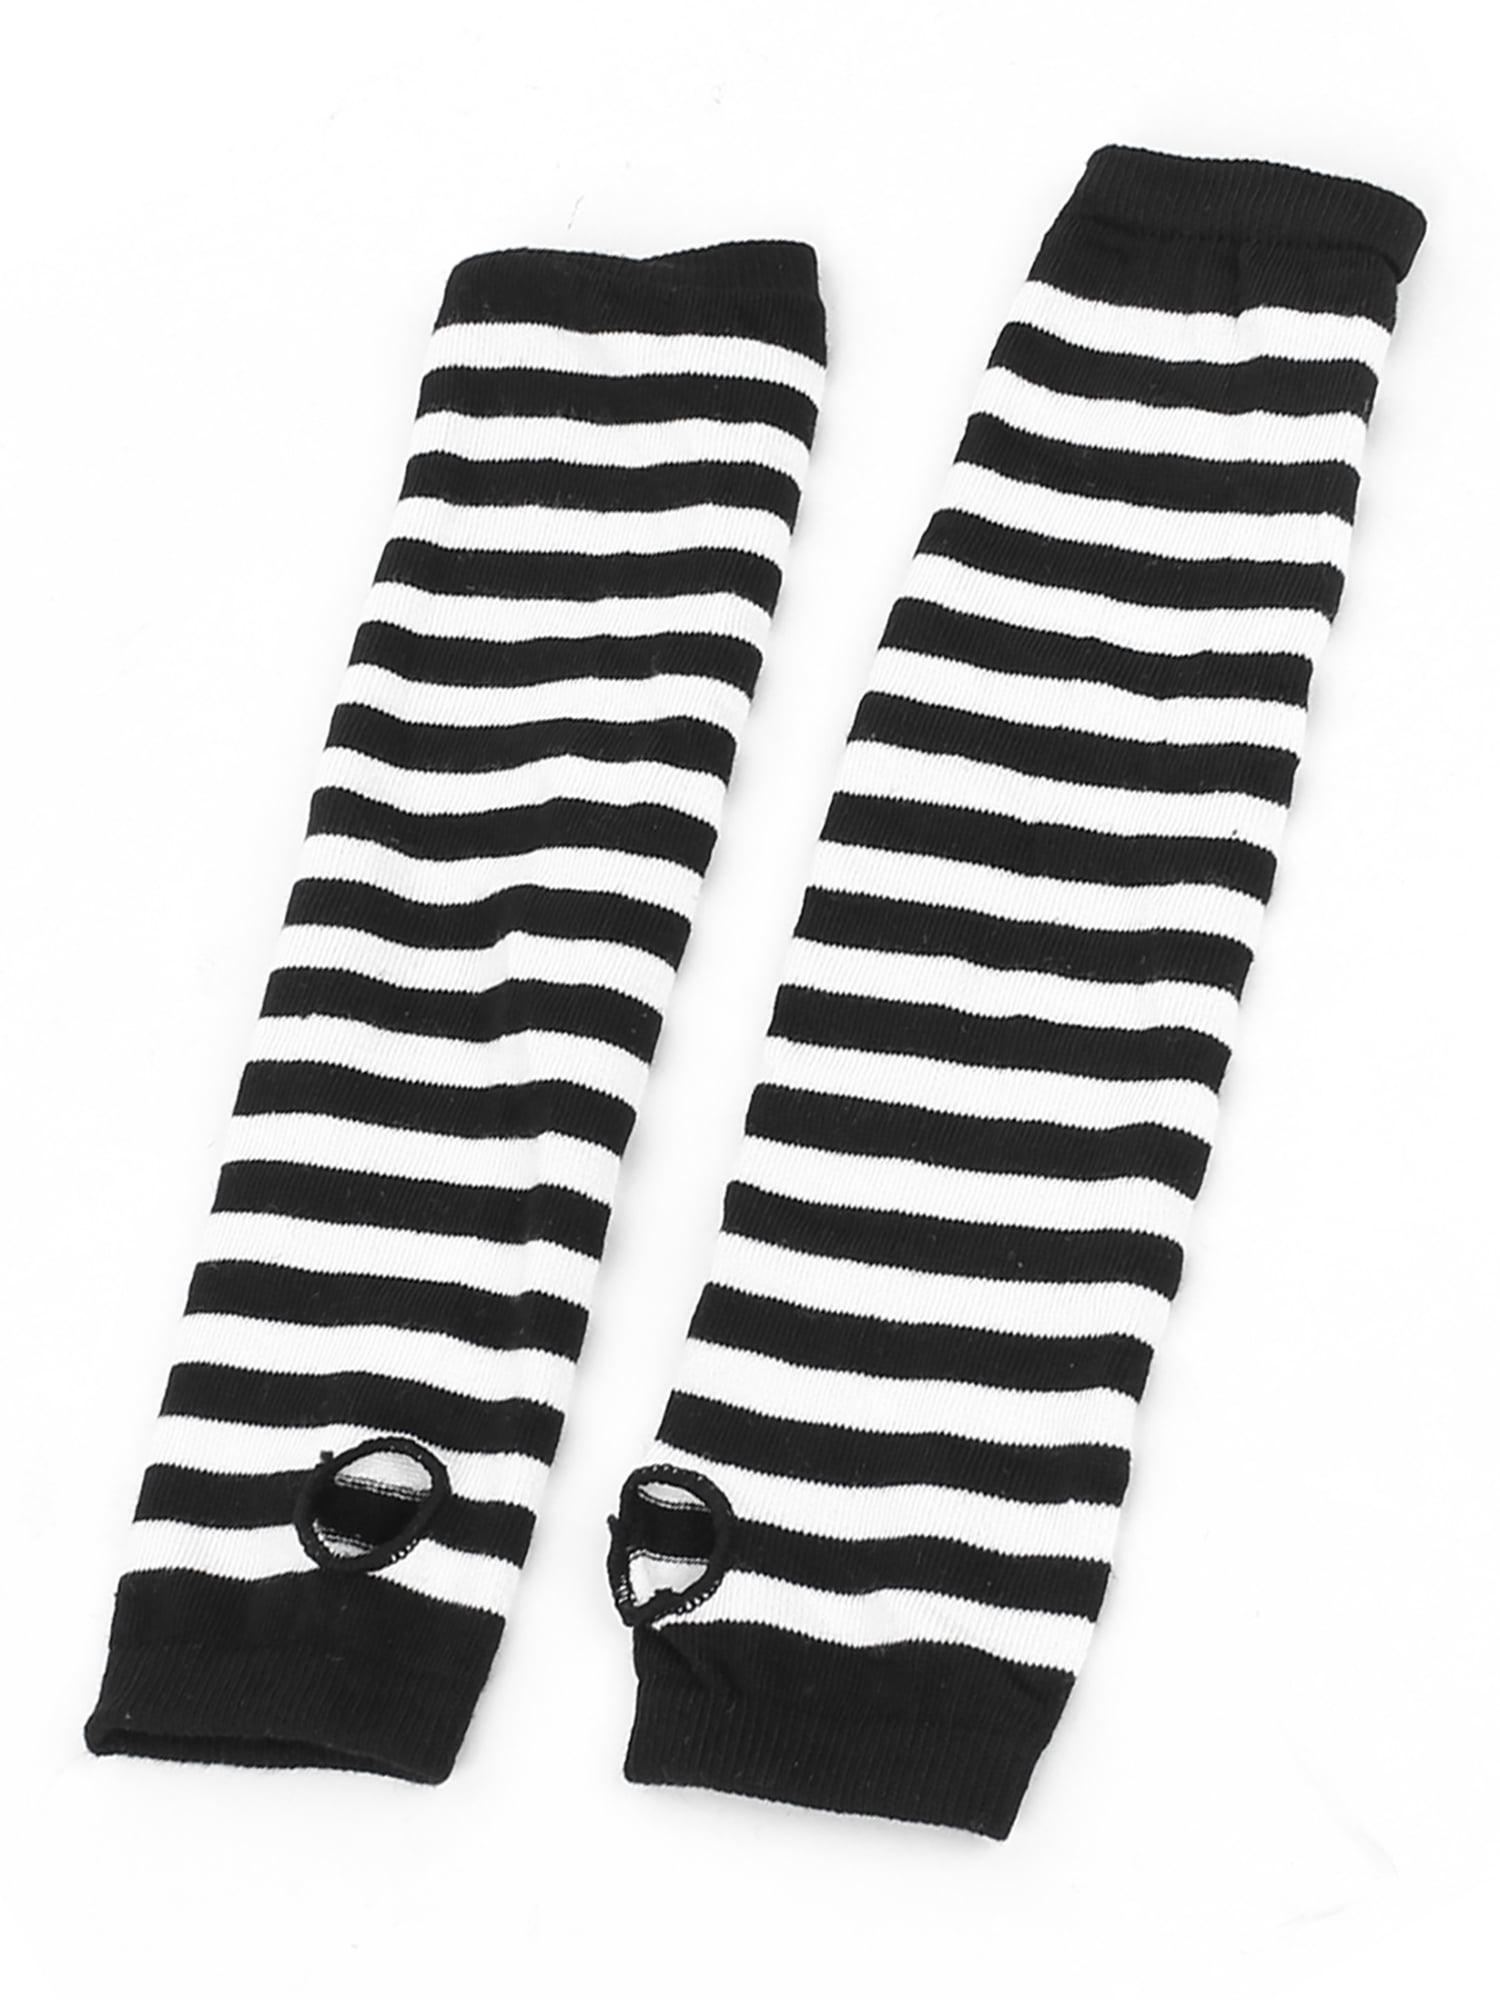 Lady Fingerless Stripes Prints Fabric Arm Long Gloves Warmers Gray Black Pair